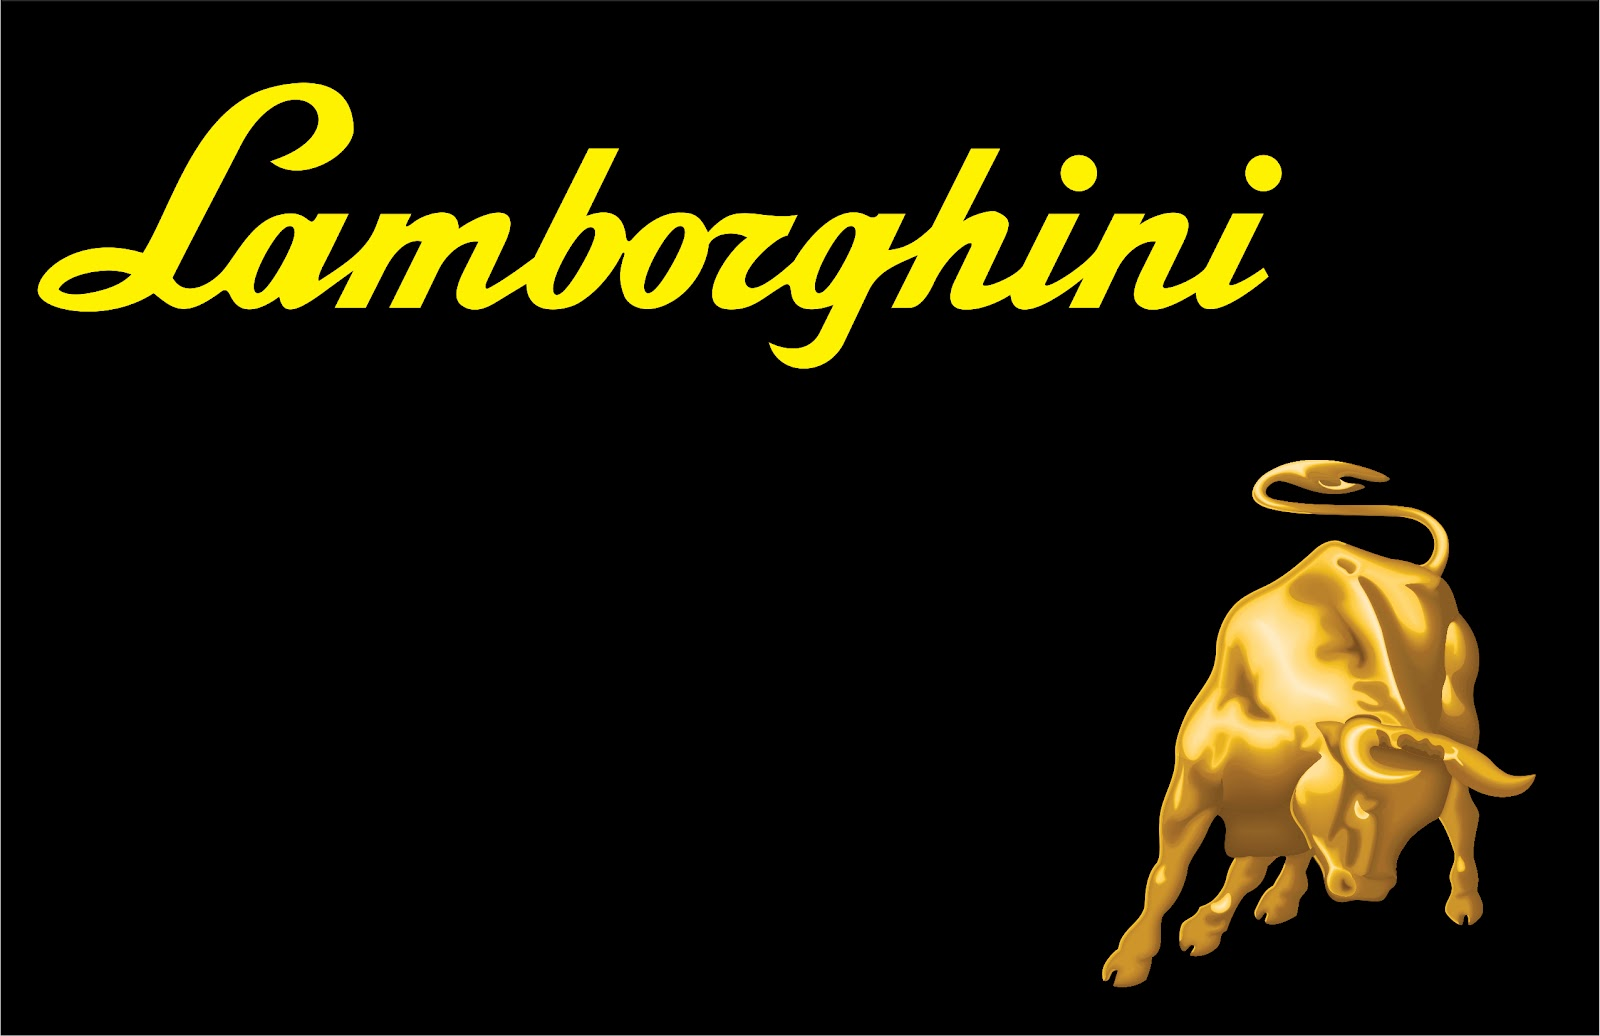 Lamborghini Logo Black Background Android Wallpaper Free Download